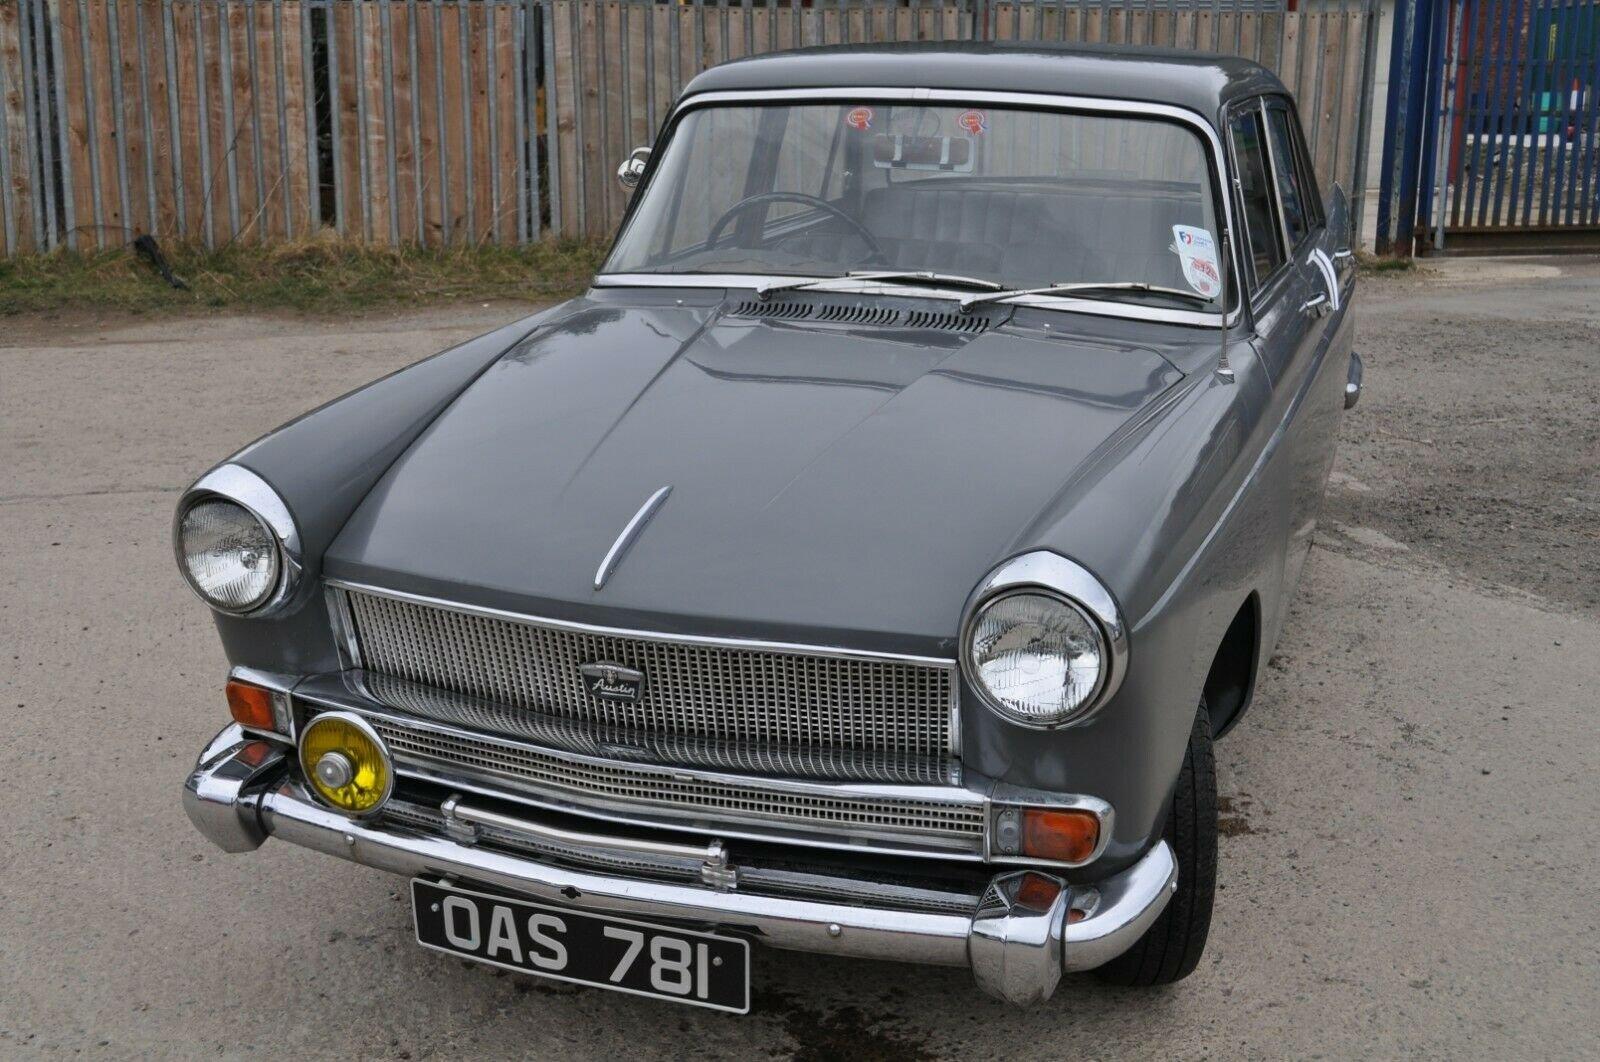 1961 AUSTIN CAMBRIDGE A55 FARINA TAX & MOT EXEMPT GRAMPIAN GREY For Sale (picture 2 of 6)